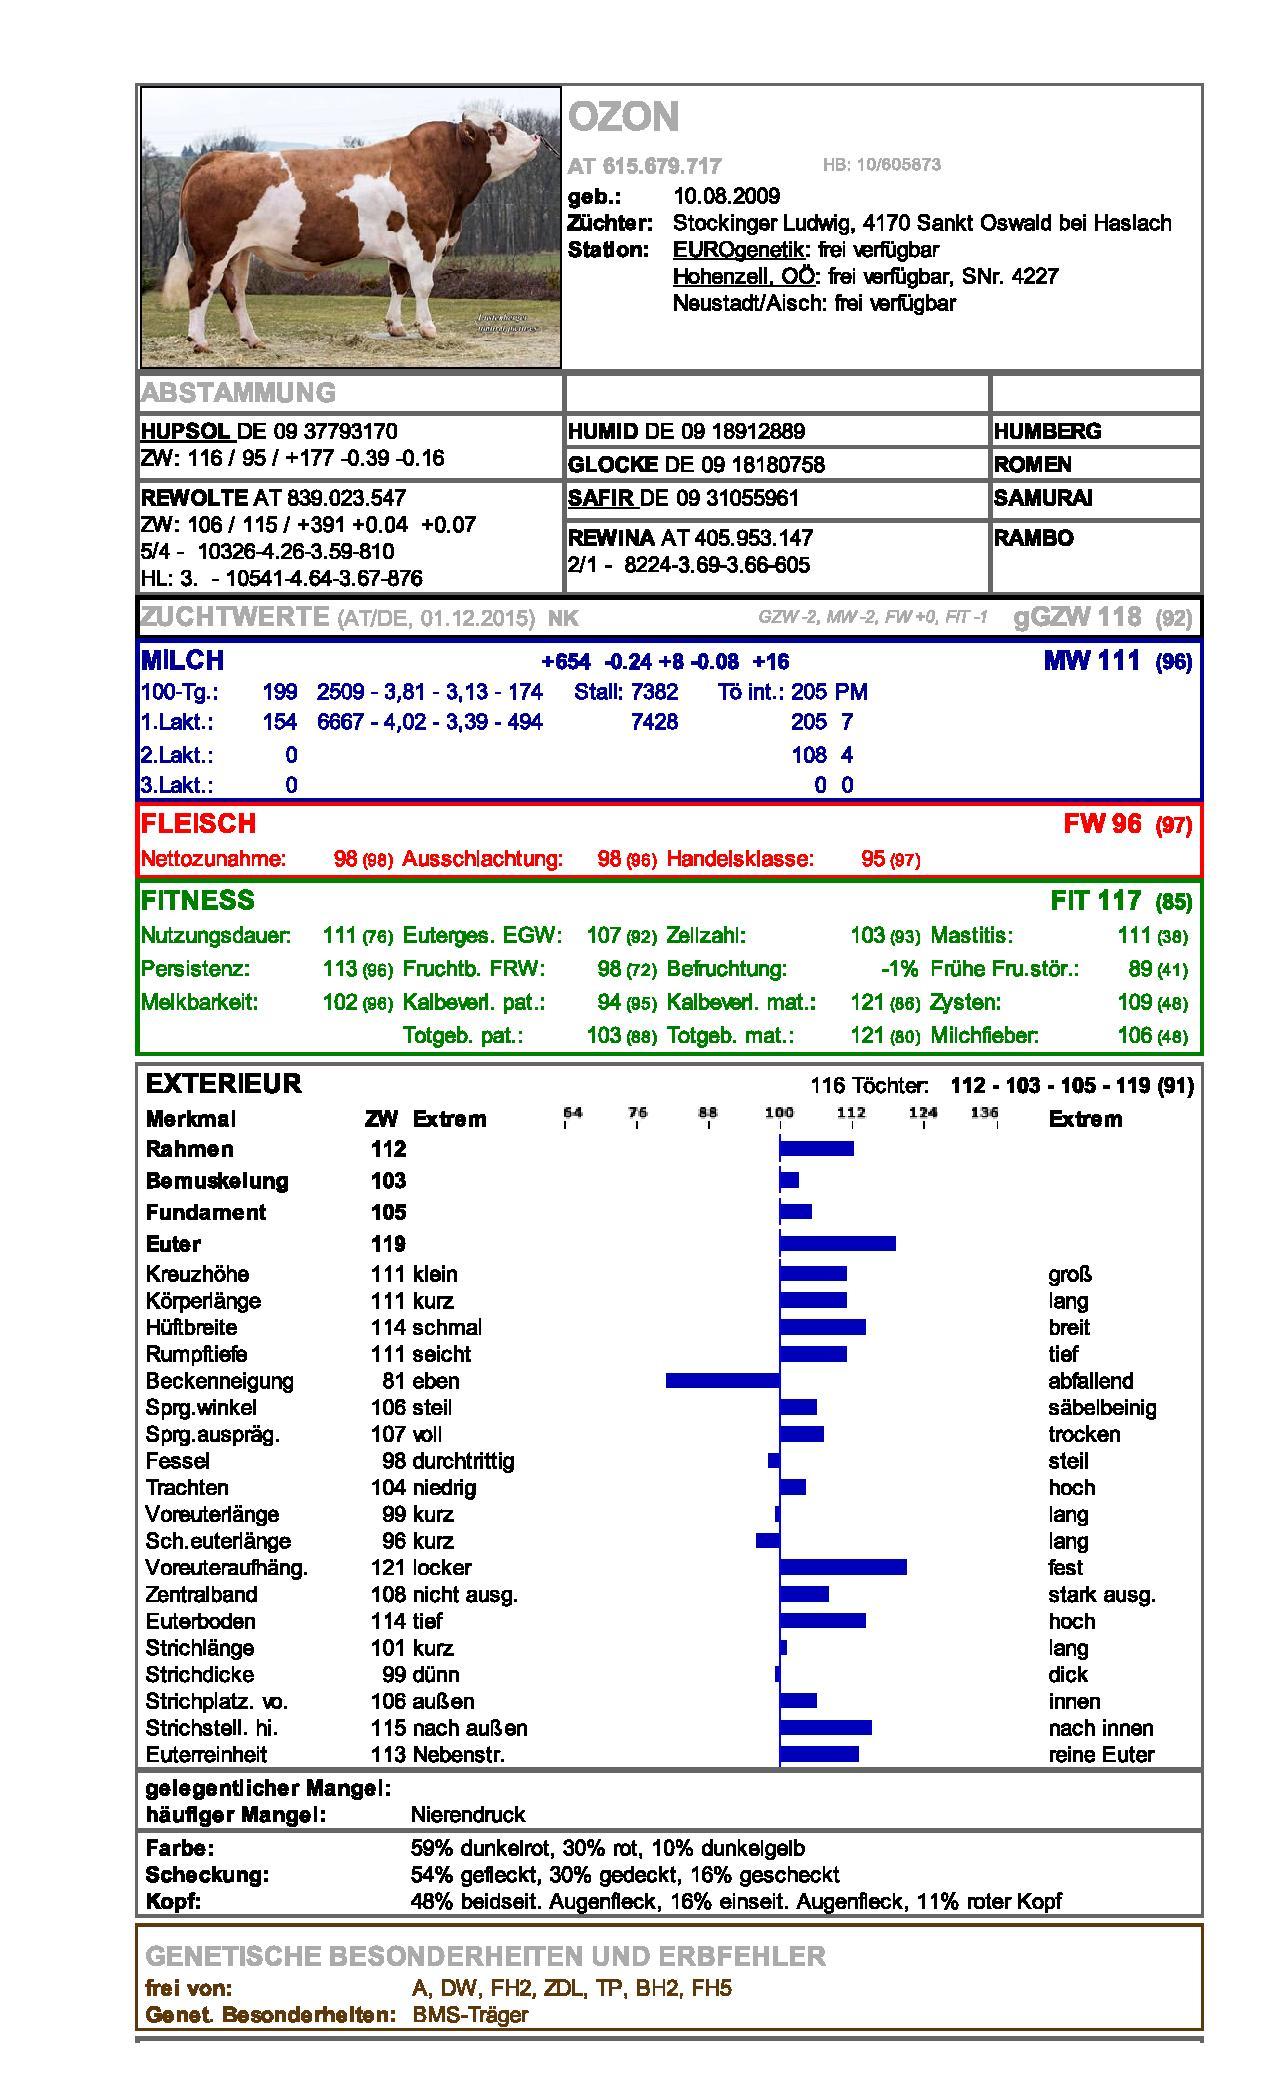 Ozon-page-001